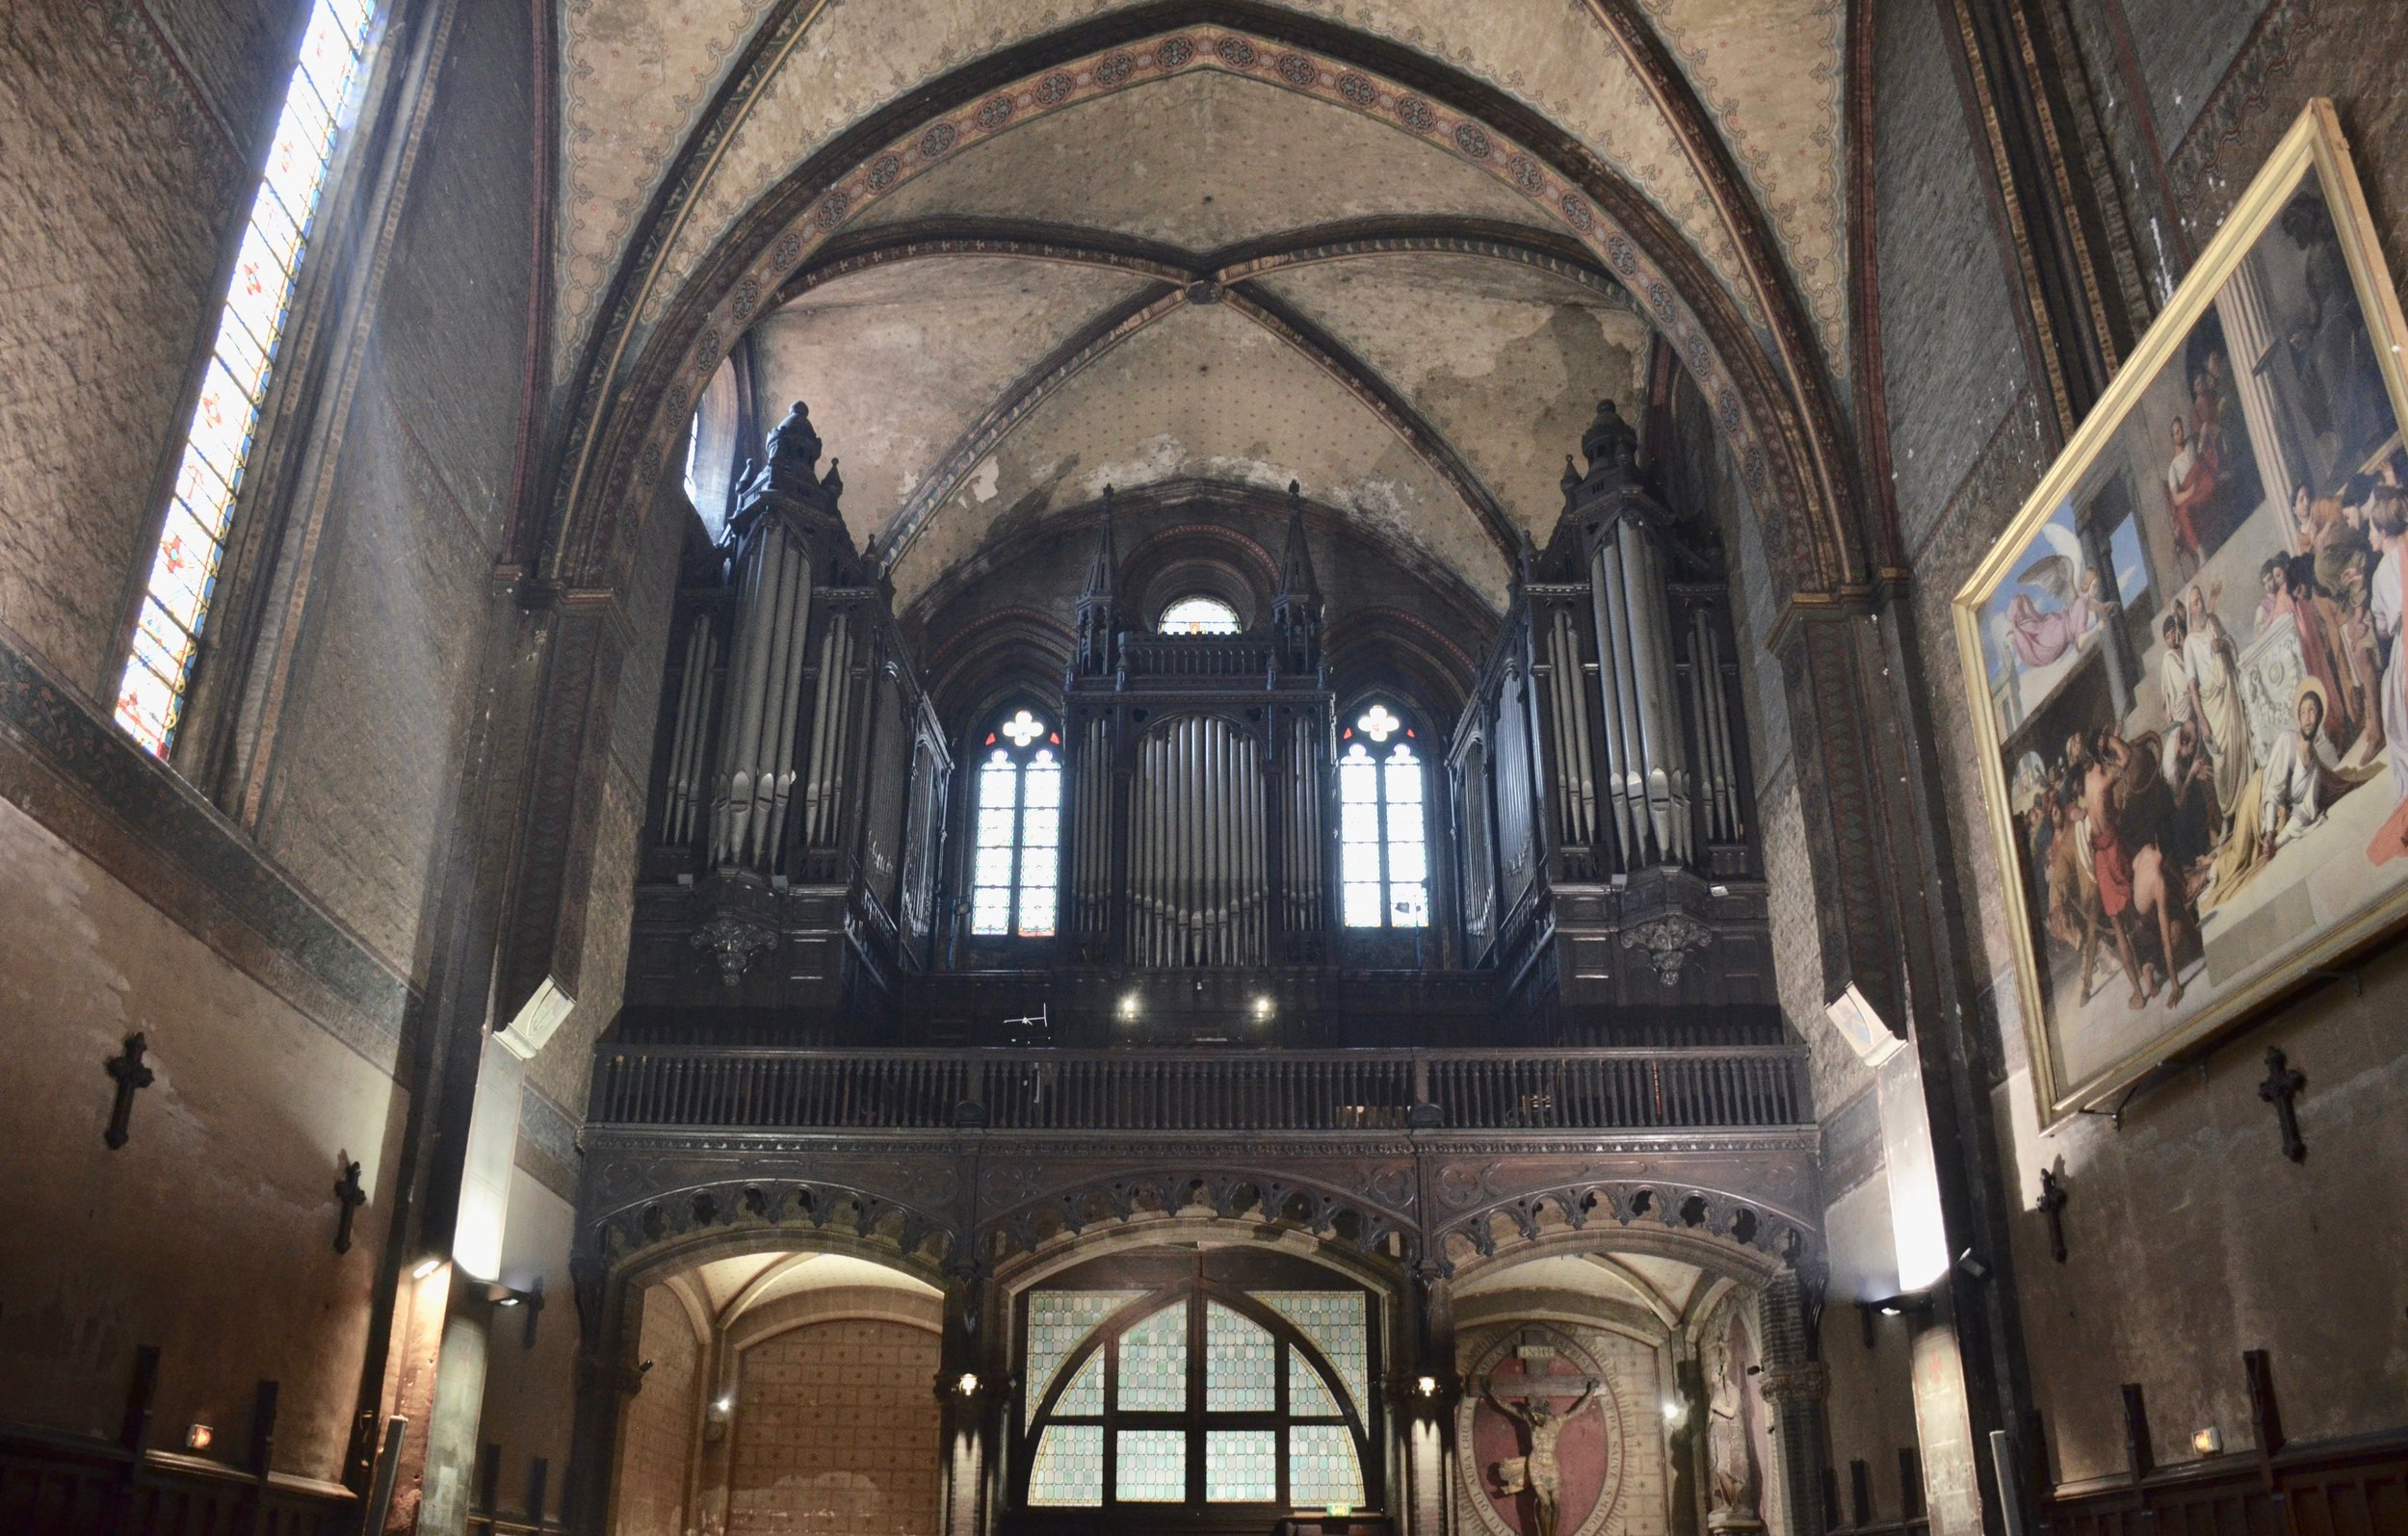 The Puget organ of Notre-Dame du Taur, Toulouse.